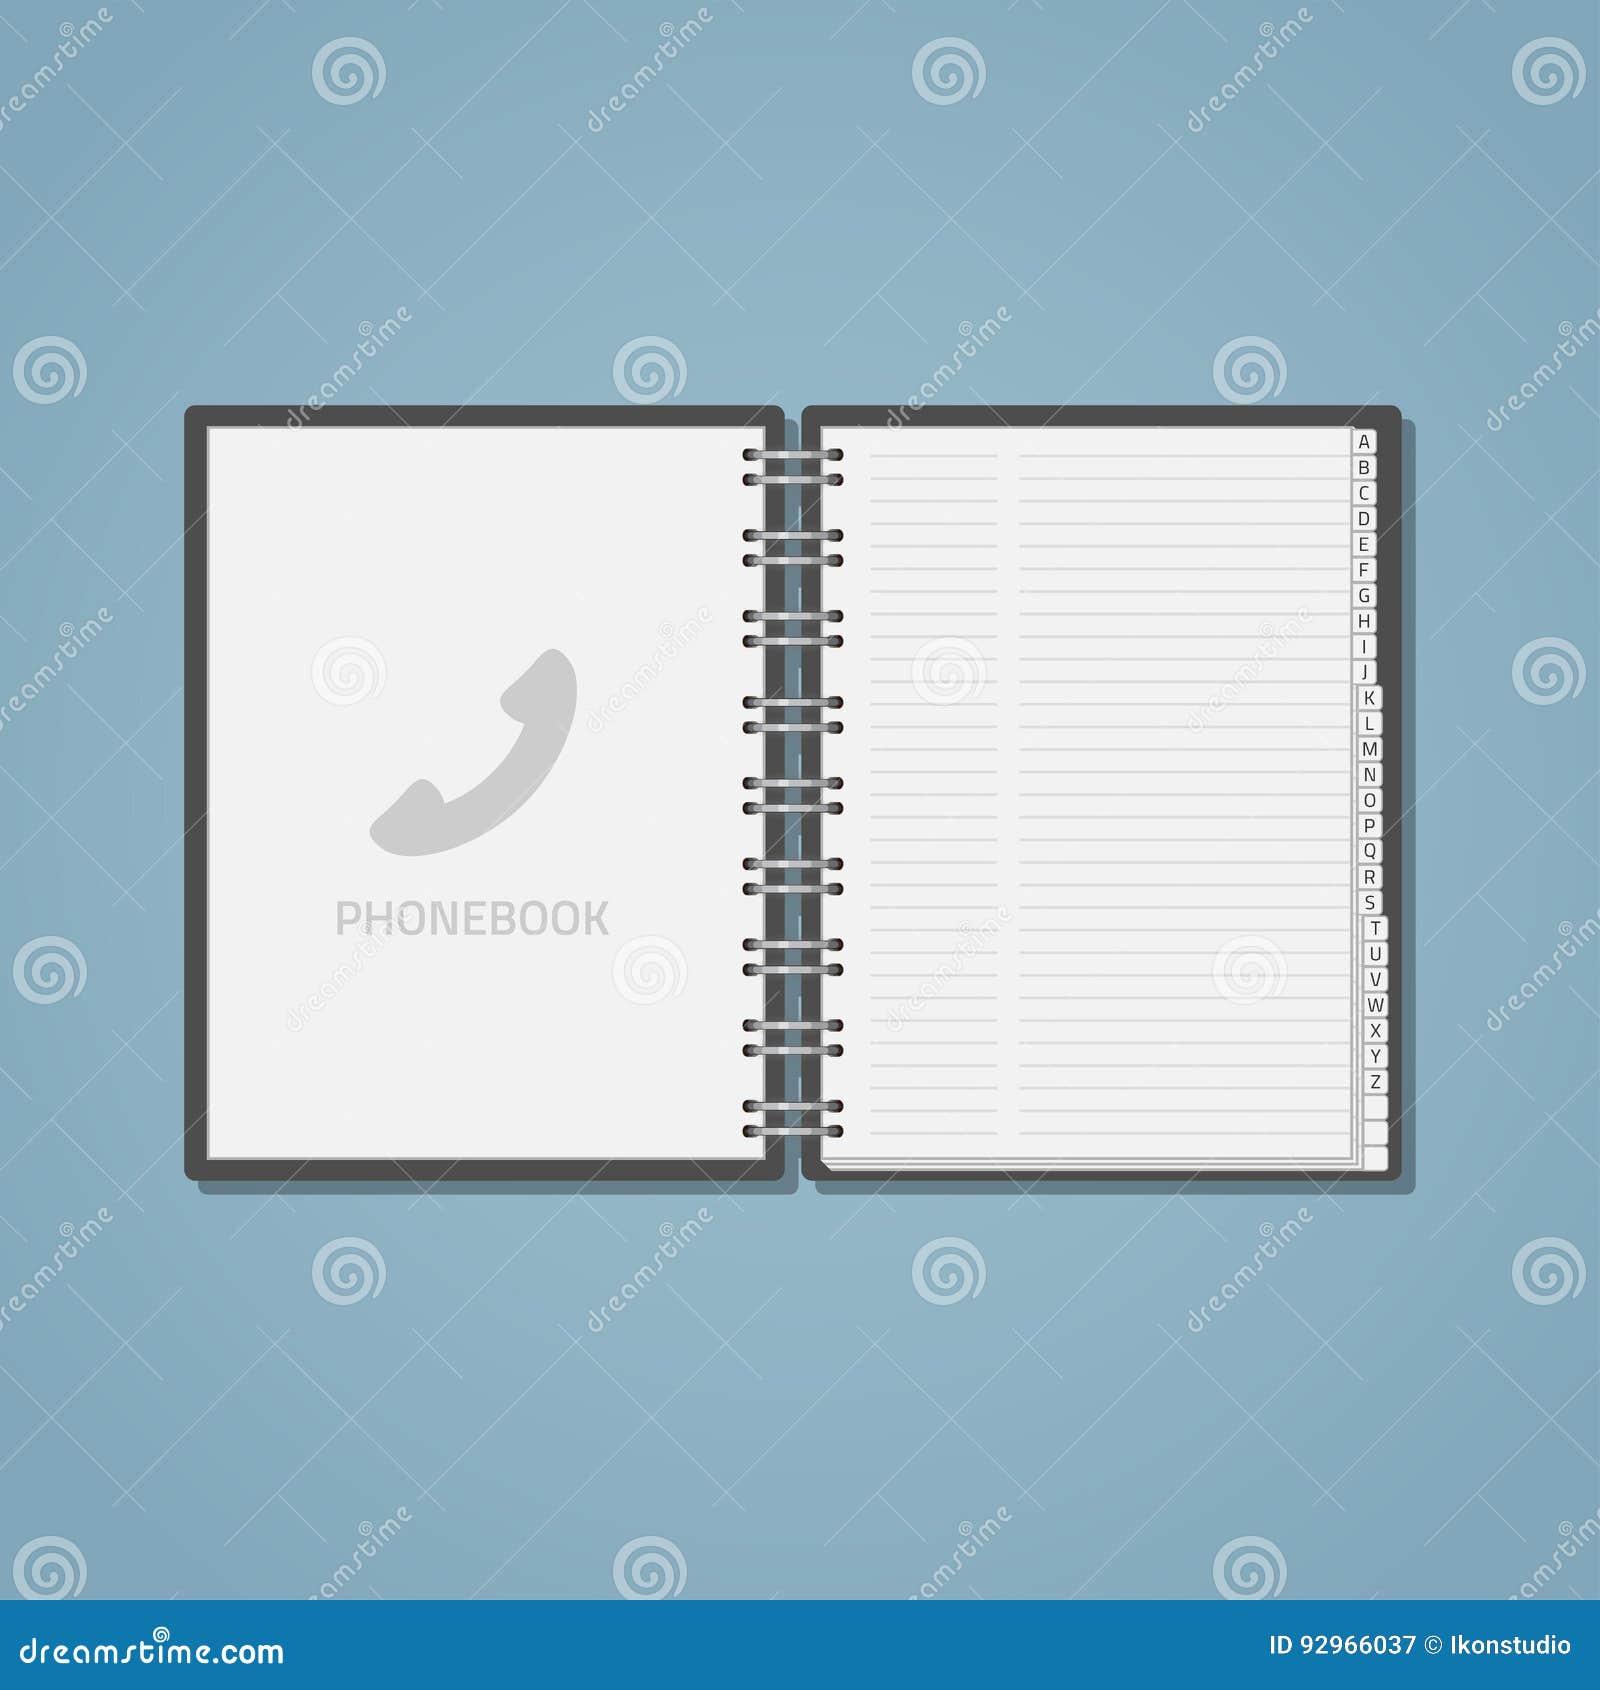 Open Phon Ebook Stock Vector Illustration Of Blank Business 92966037